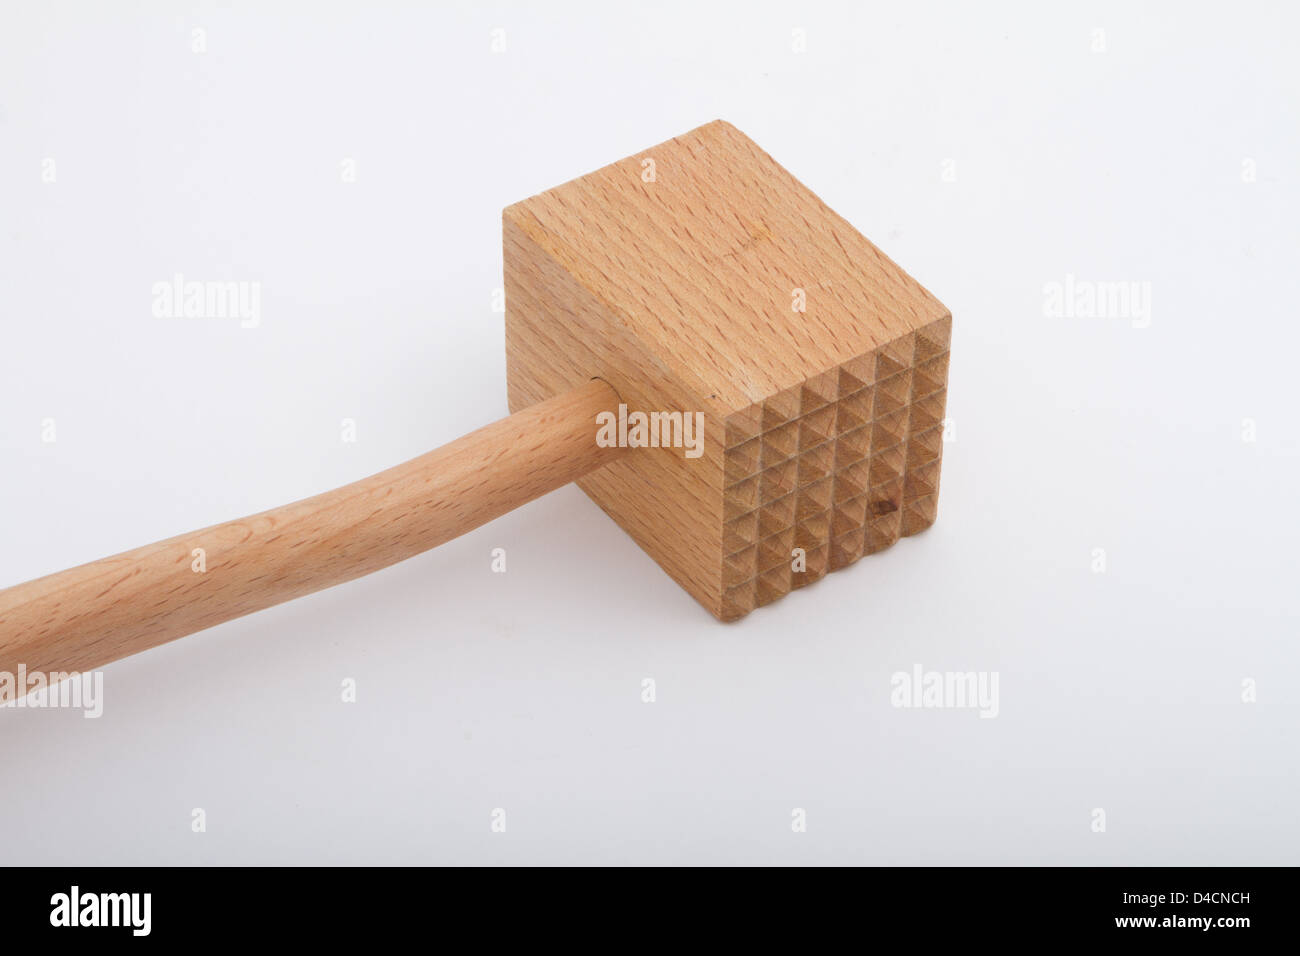 Tenderizer, Hammer, Fleisch, Objekt, Essen, Wiederholung Stockbild